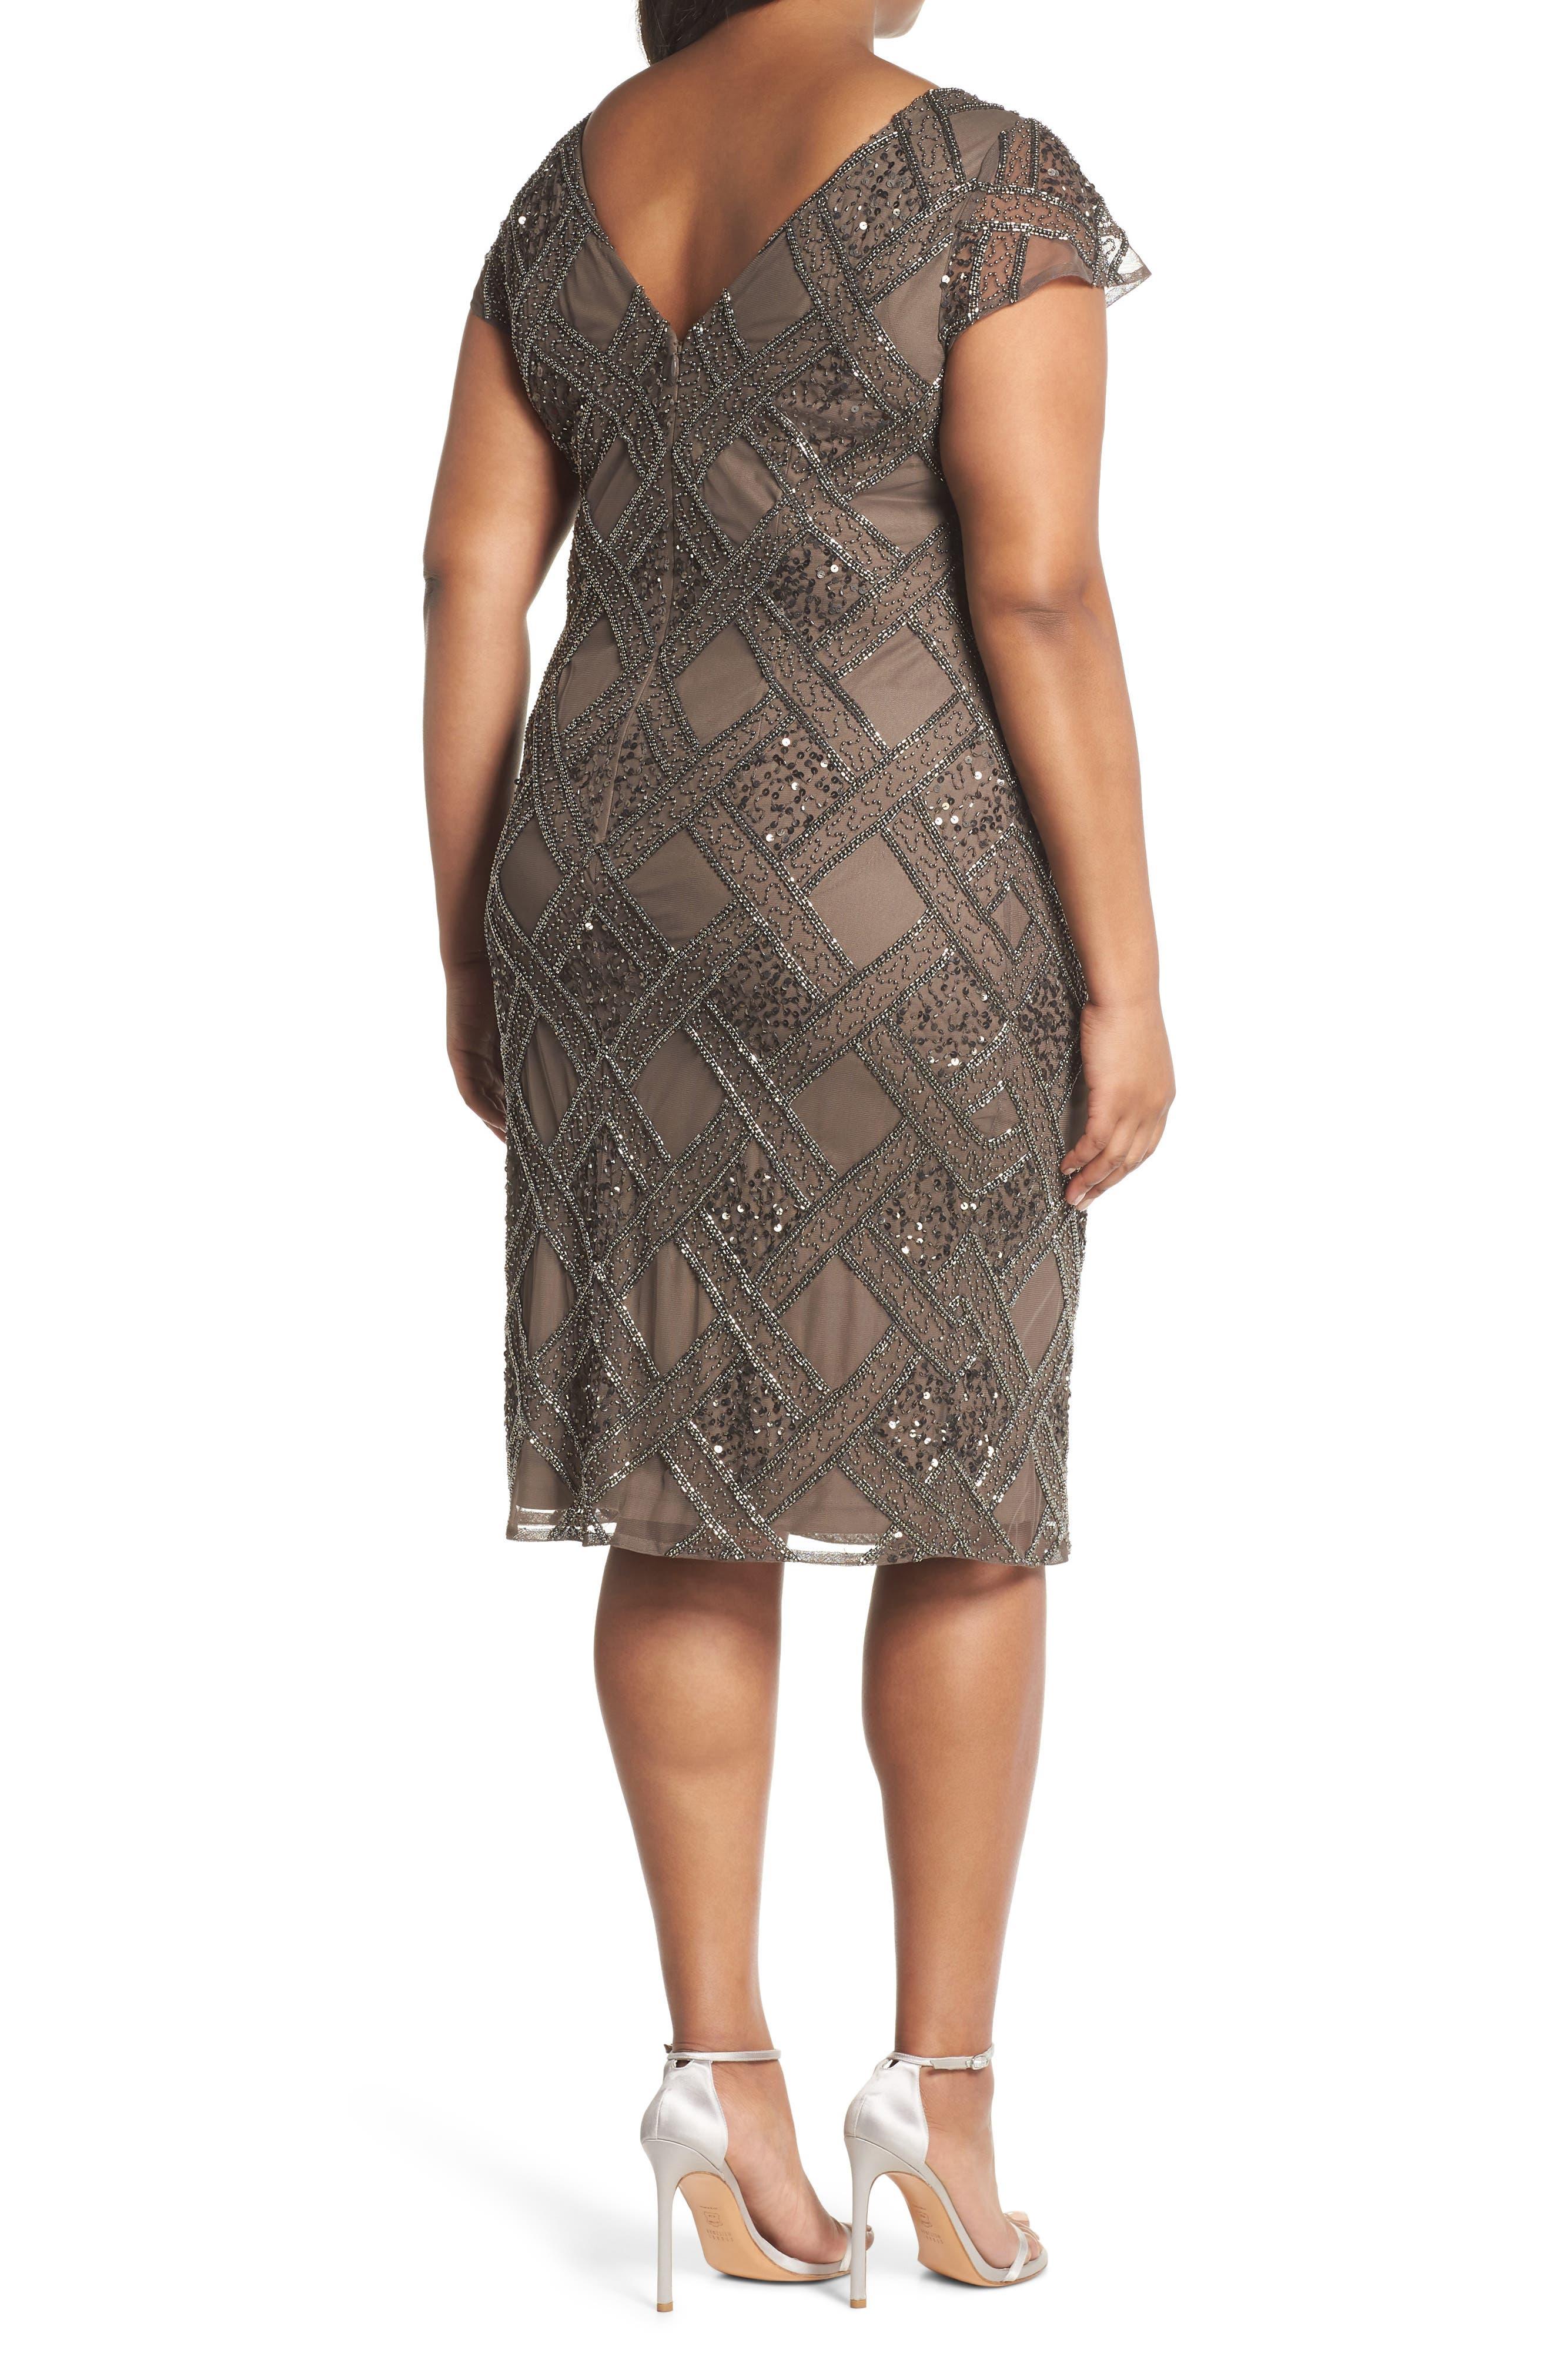 ADRIANNA PAPELL,                             Beaded Cap Sleeve Sheath Dress,                             Alternate thumbnail 2, color,                             050